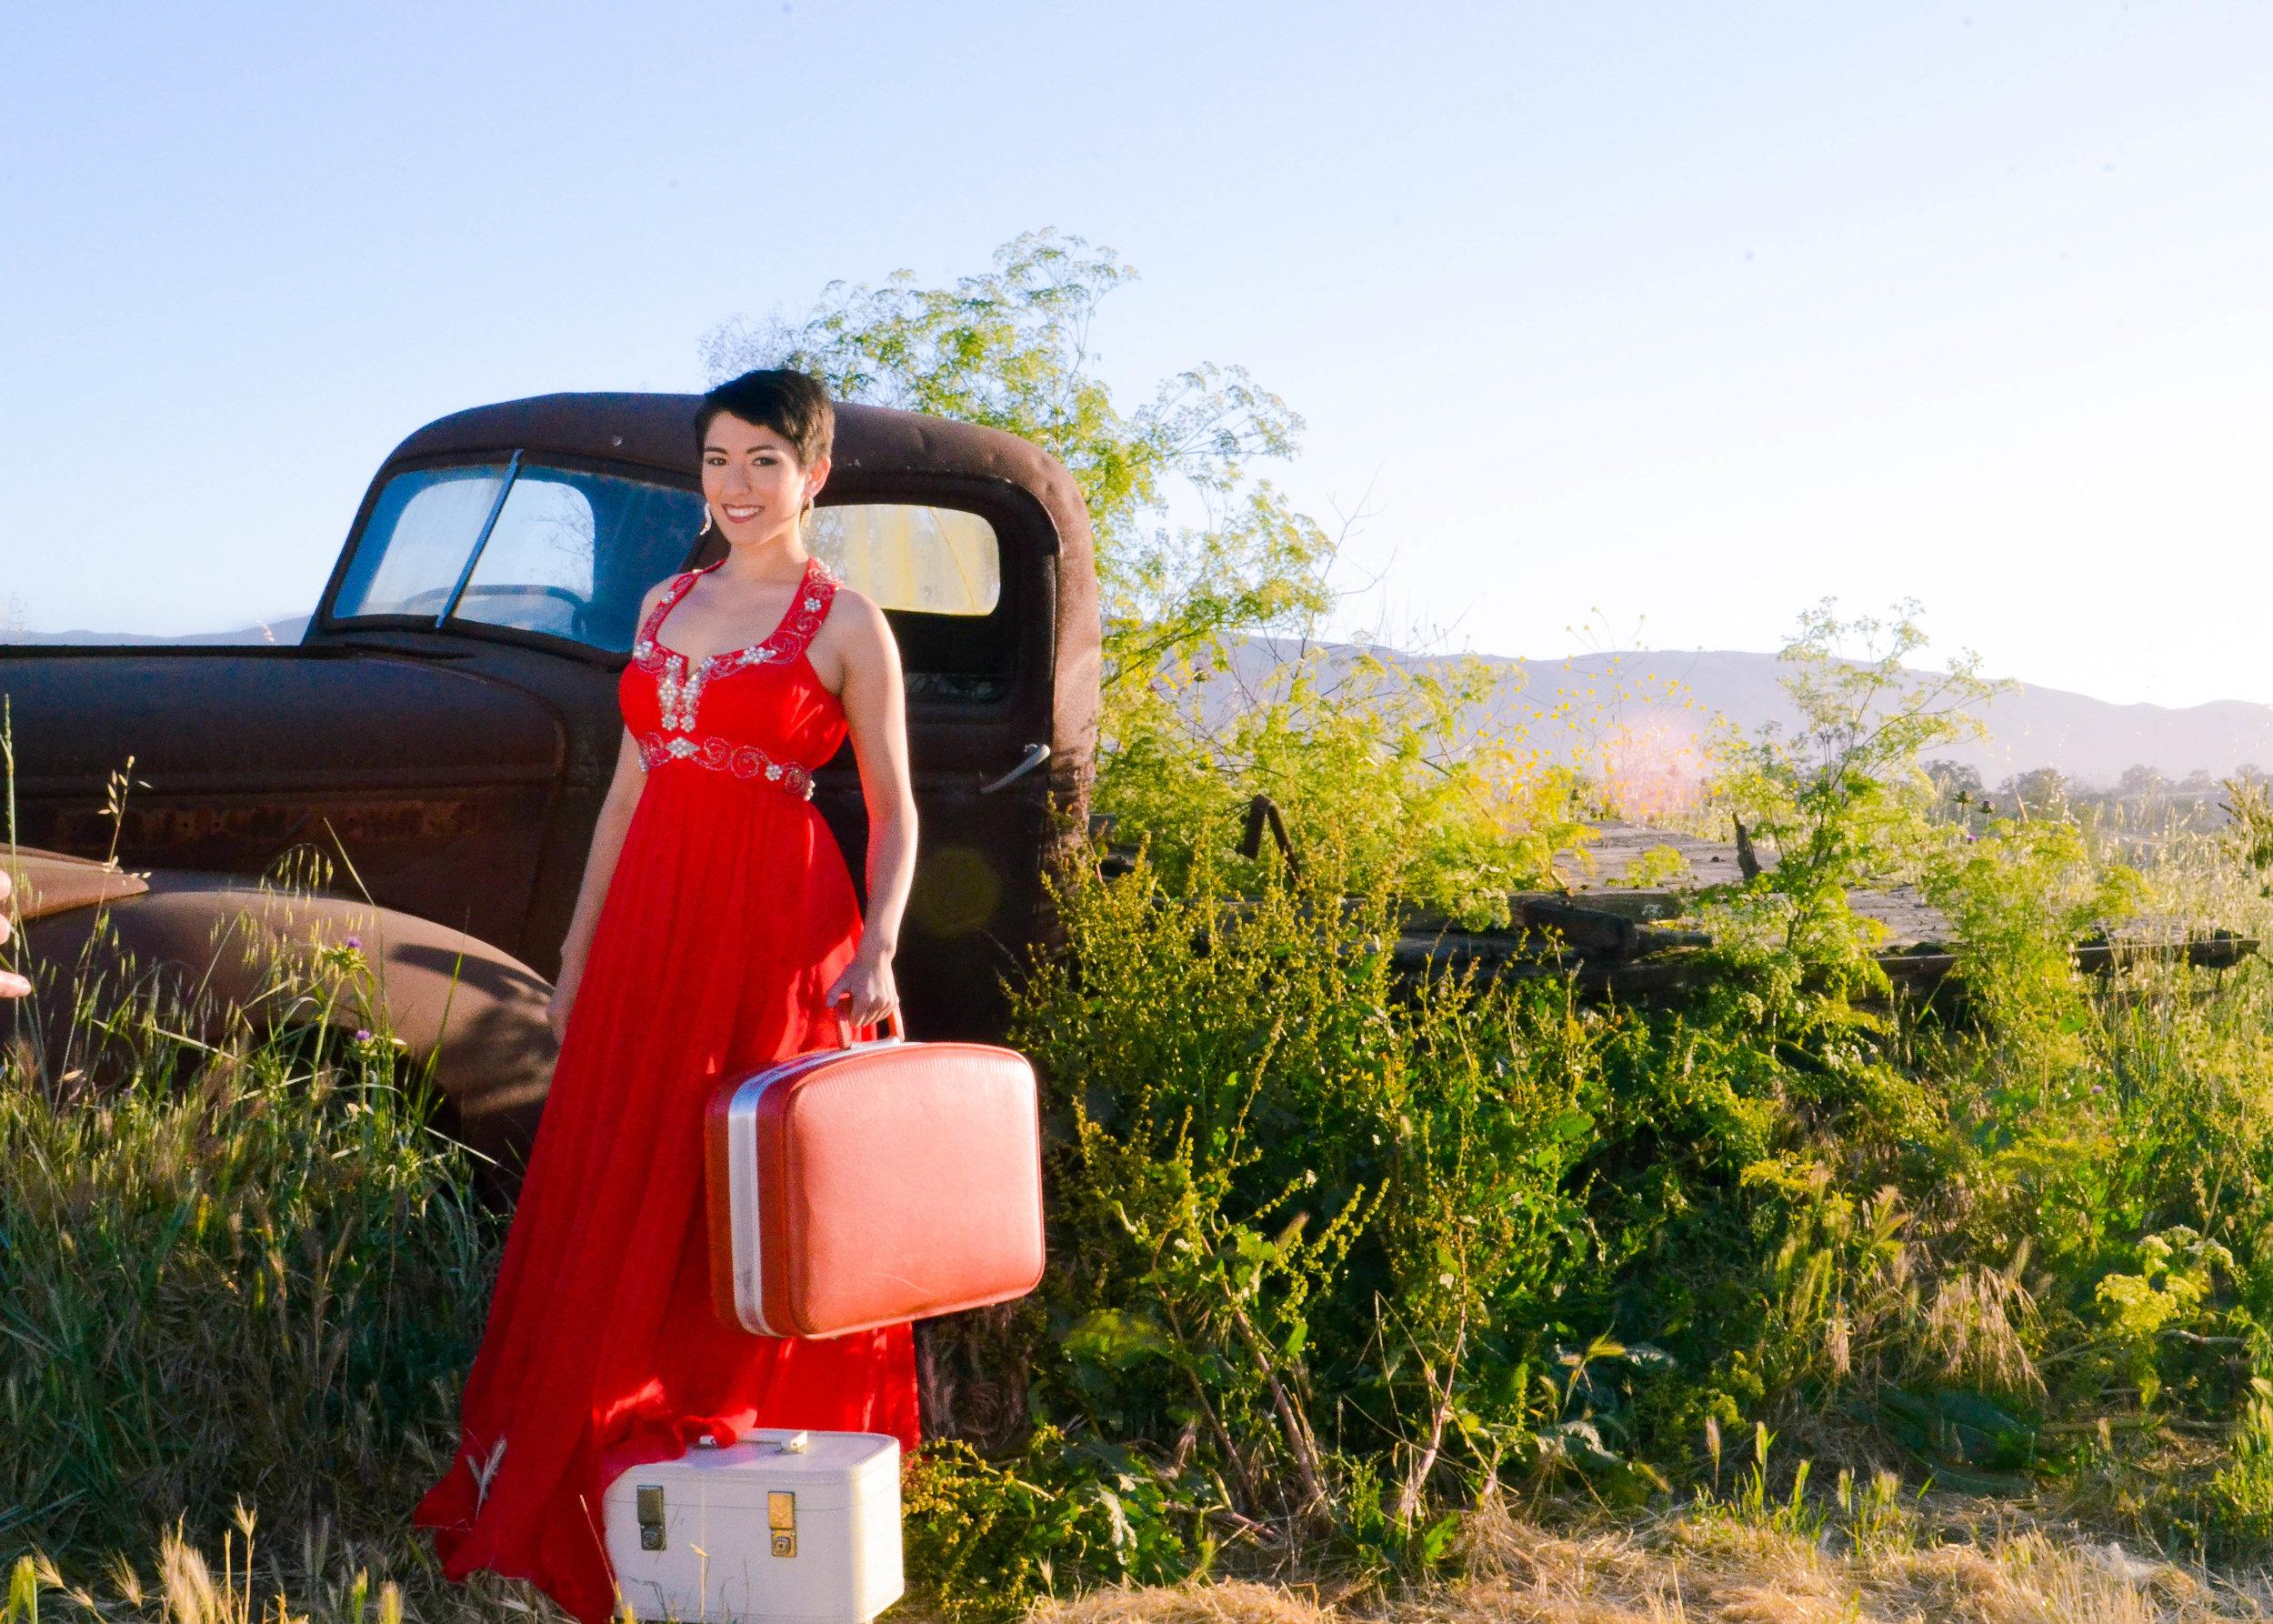 Shayna-Lee-Luggage.jpg